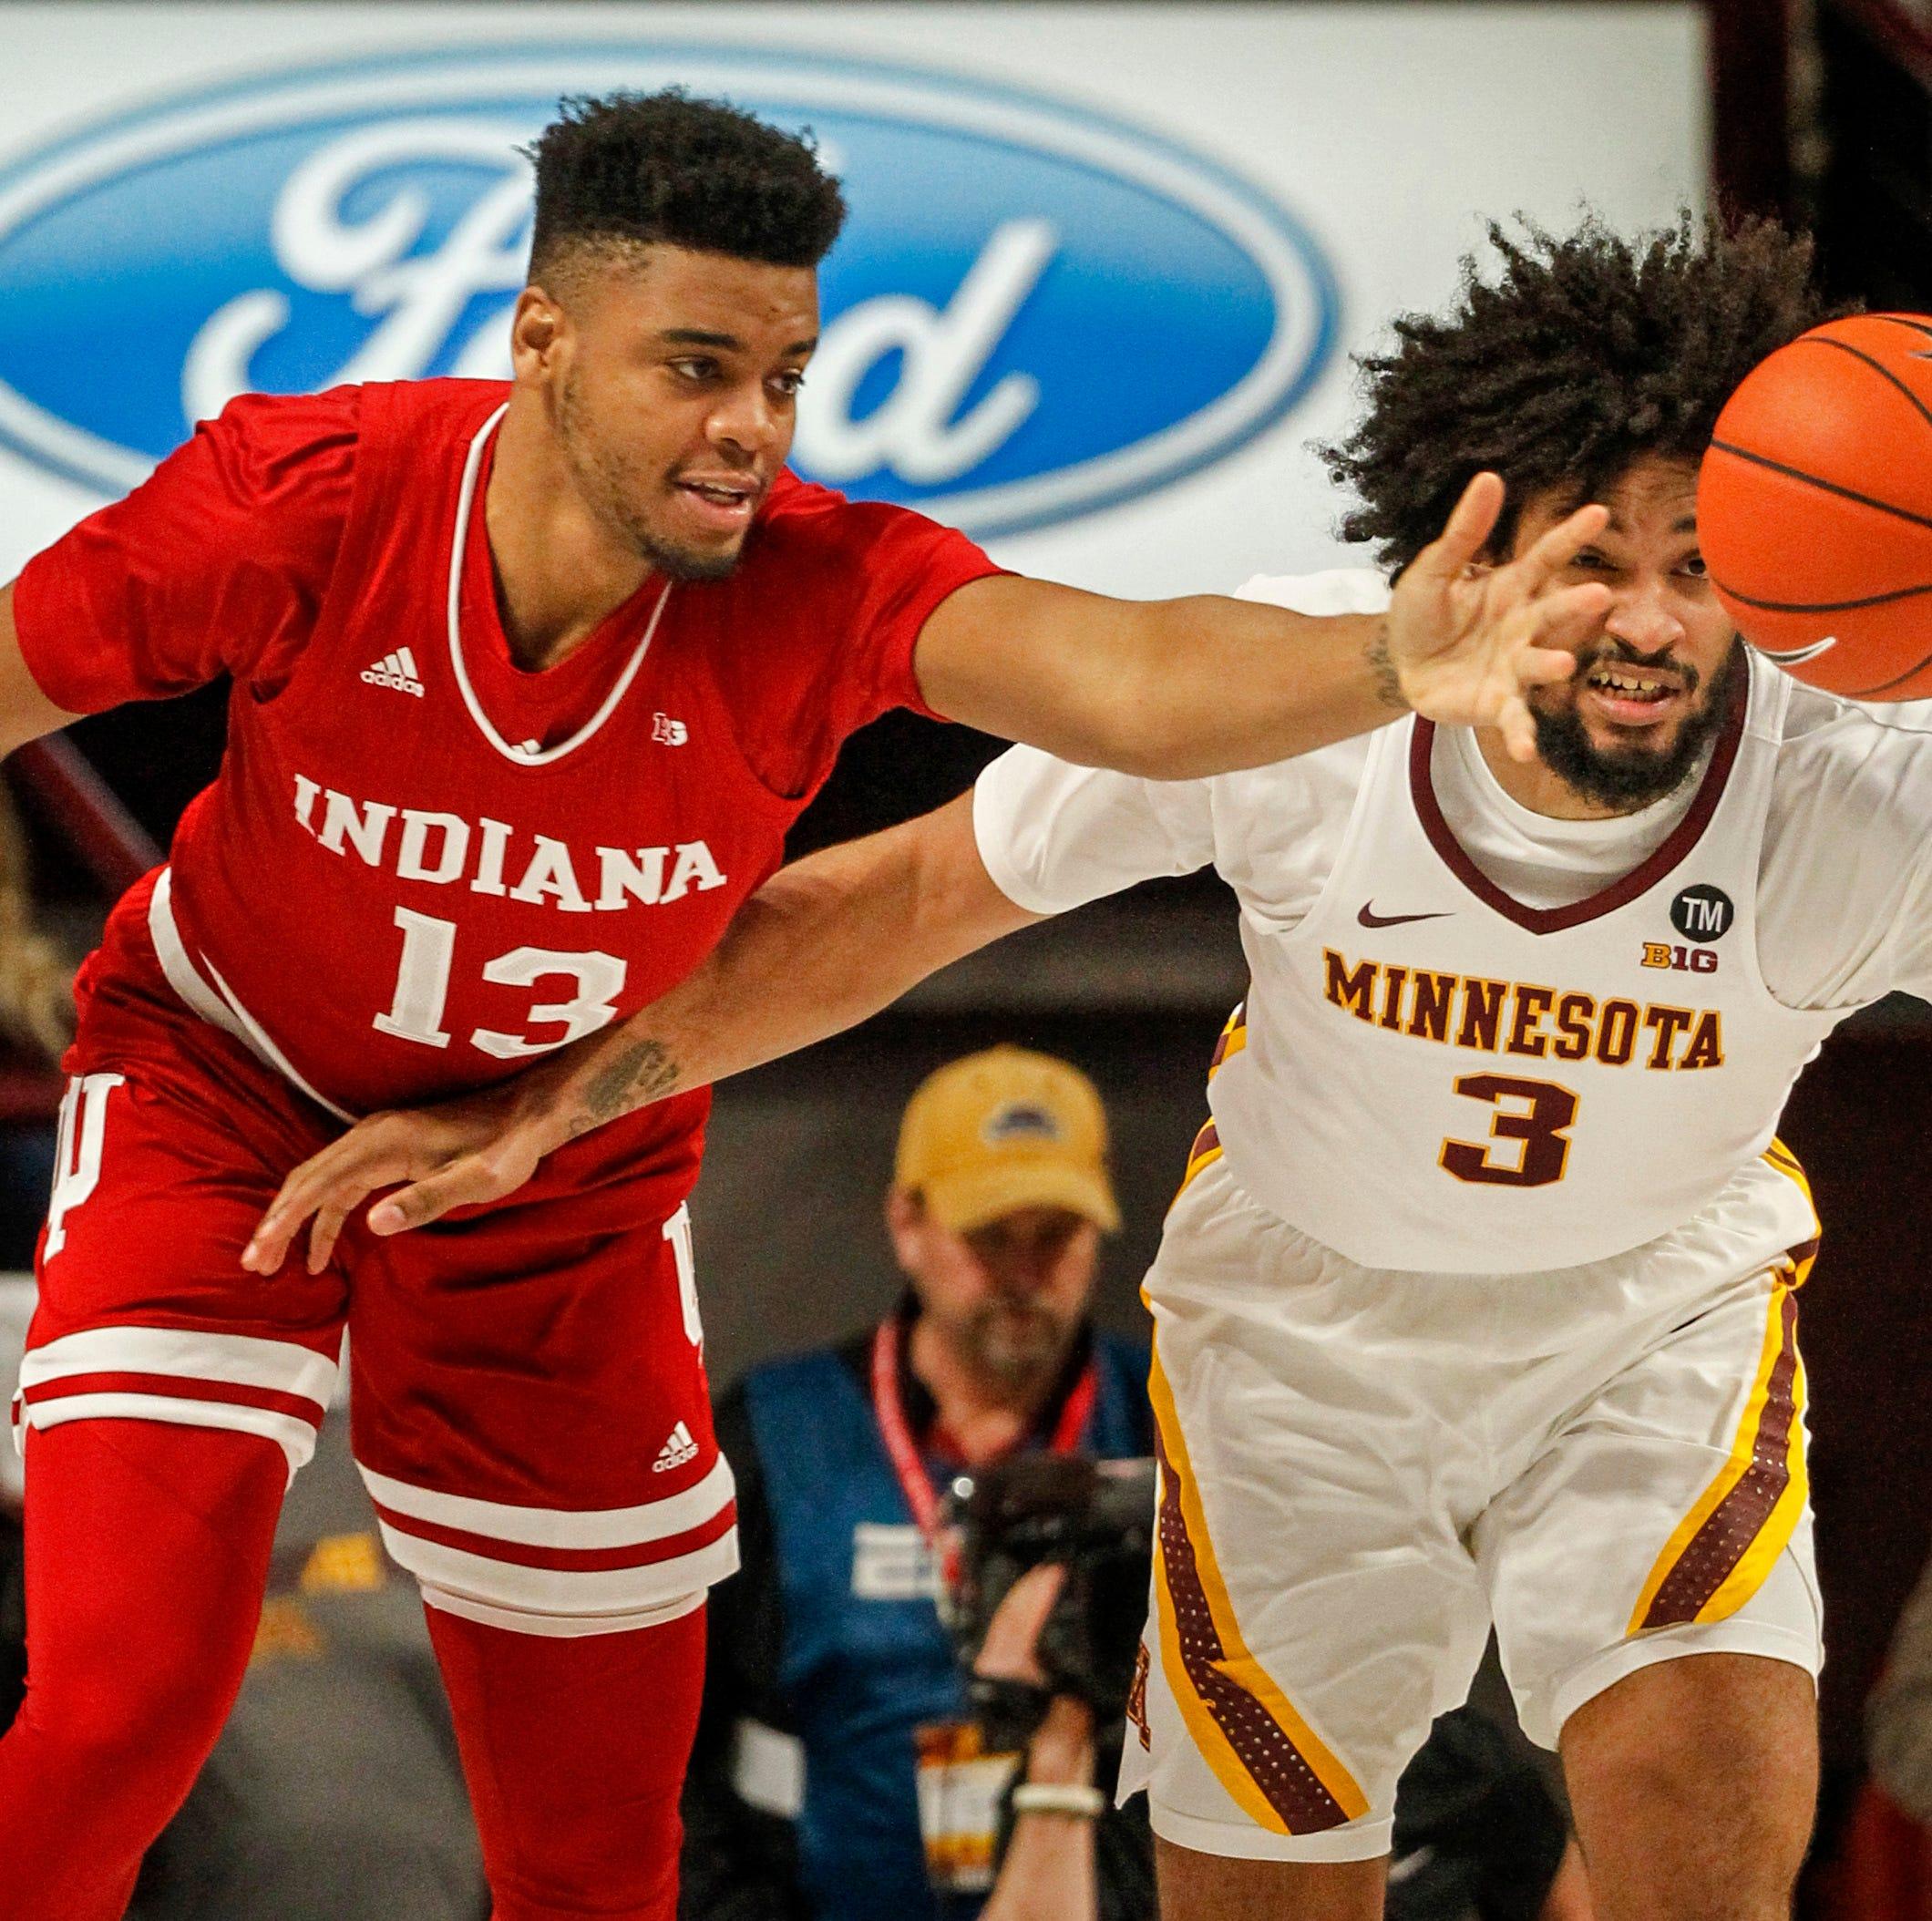 Indiana's Juwan Morgan (13) and Minnesota's...